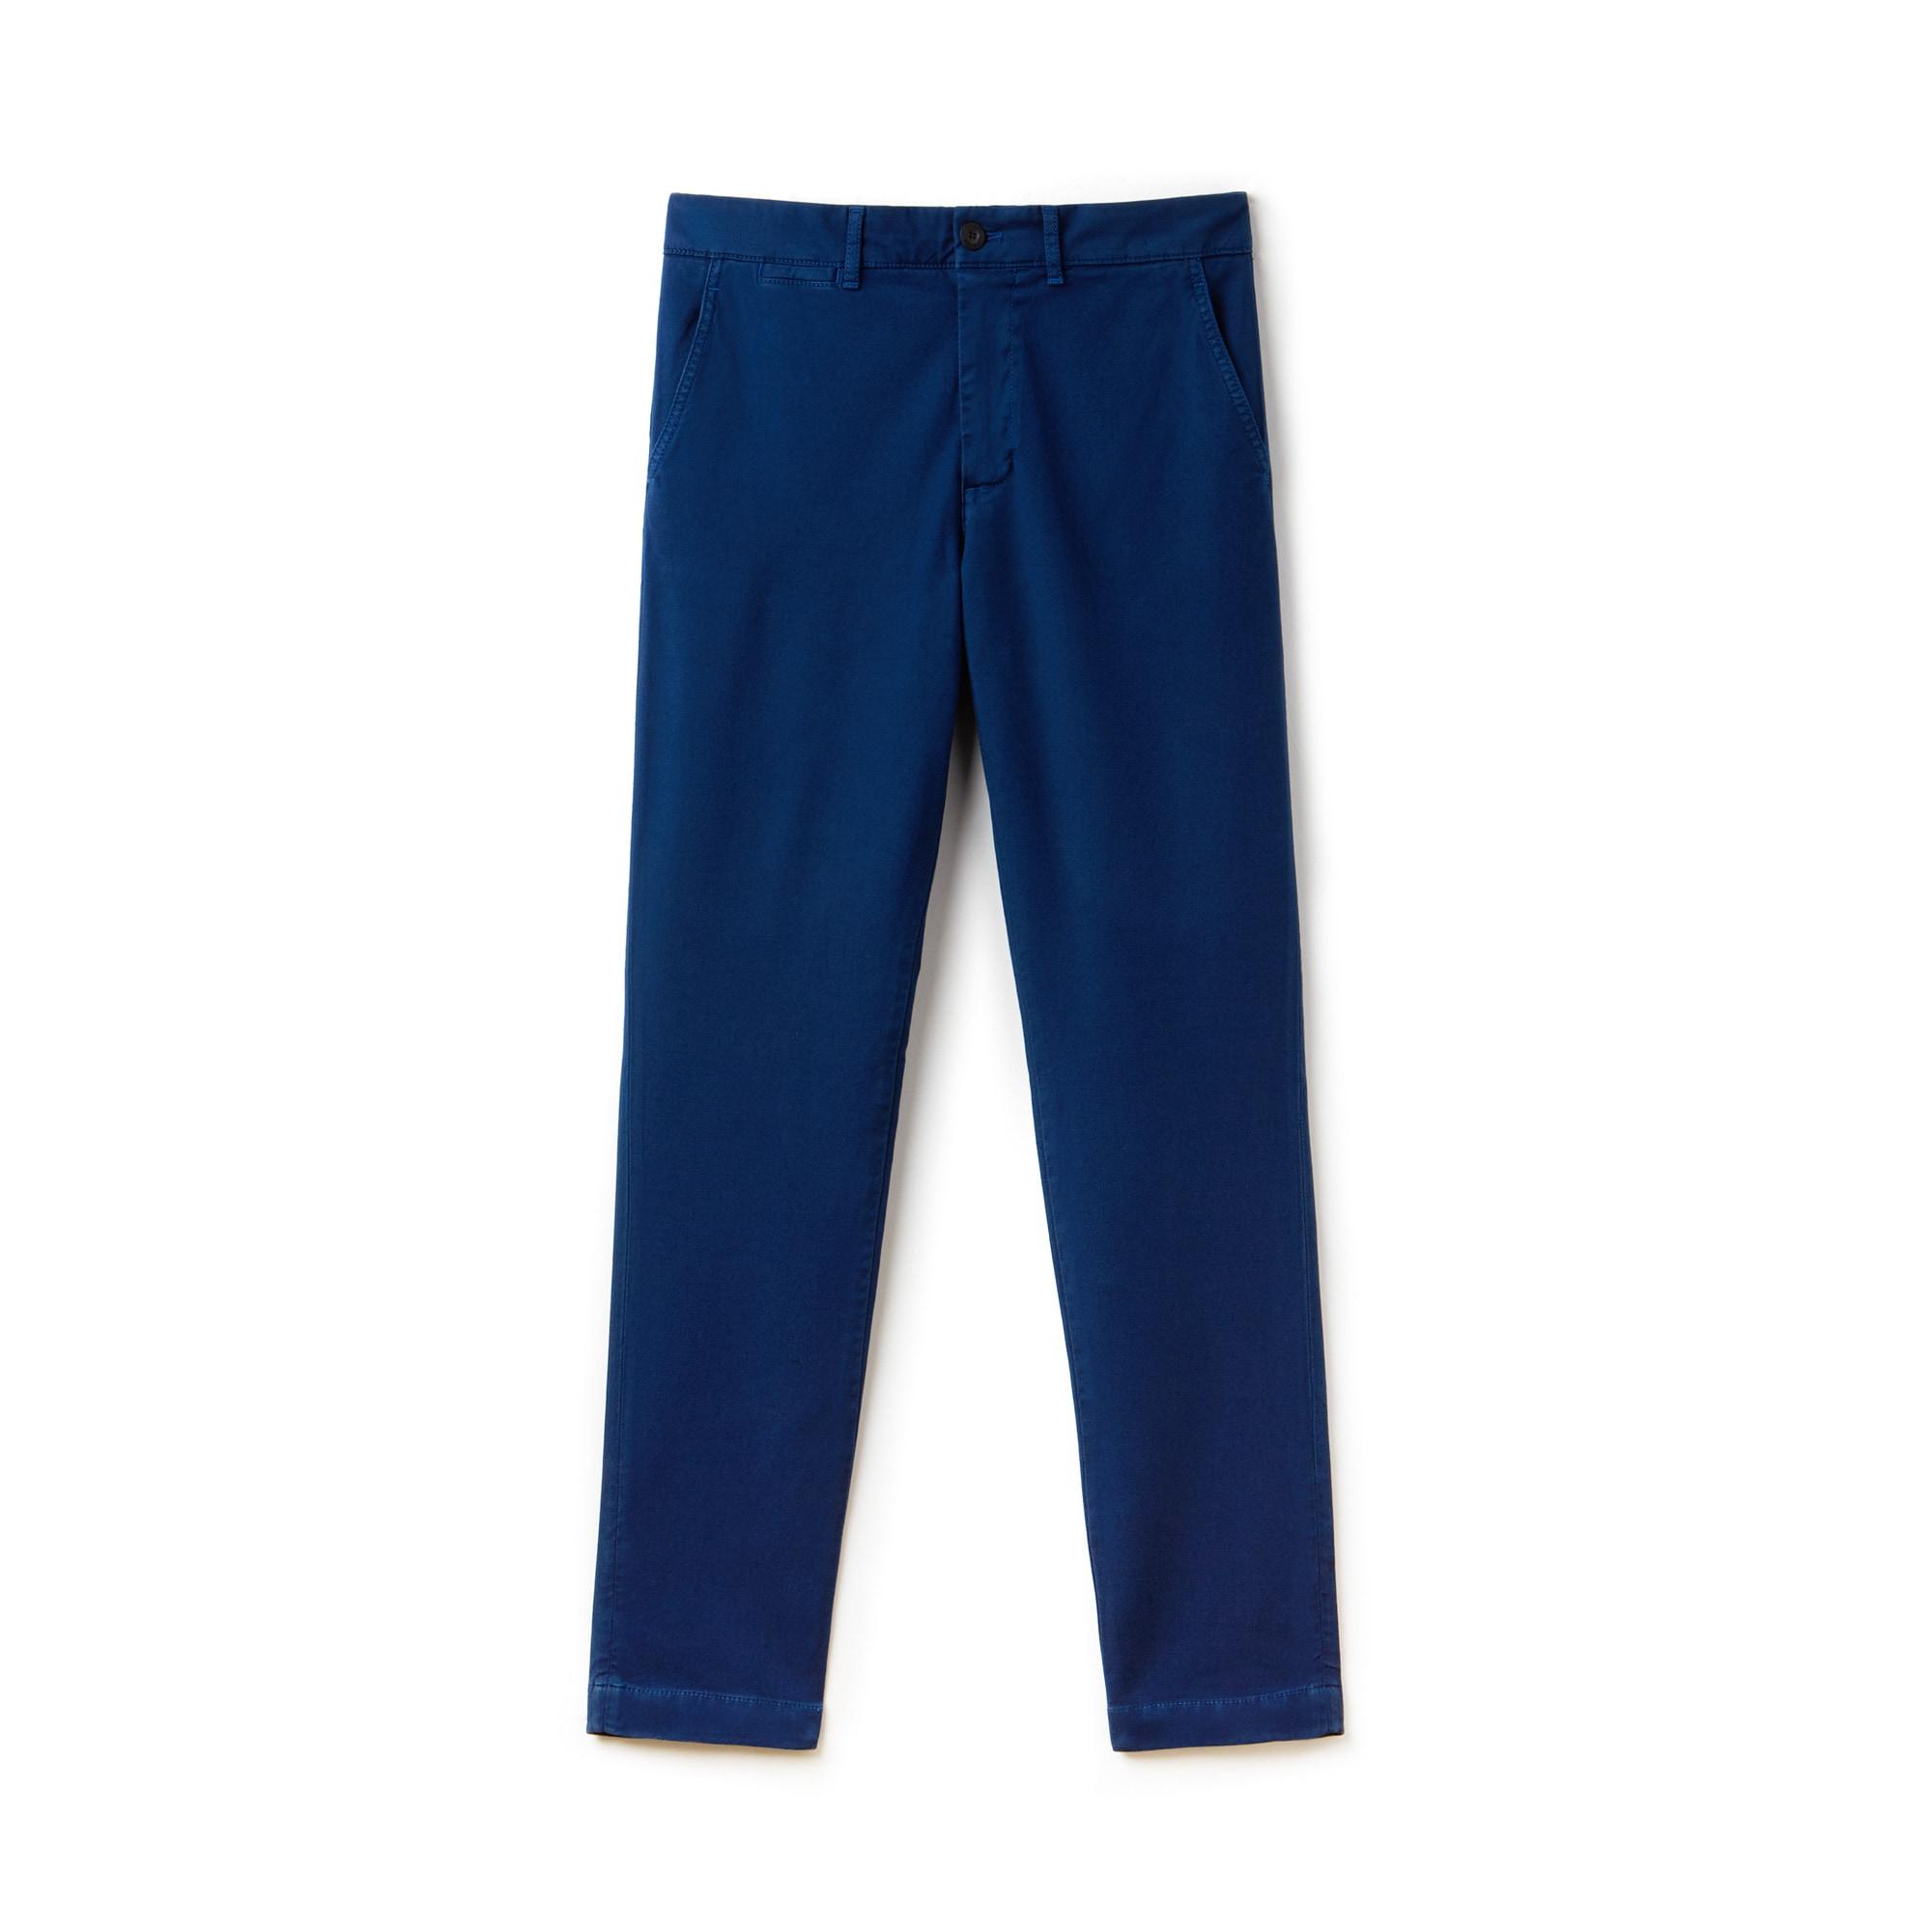 Men's Slim Fit Texturized Stretch Cotton Chino Pants